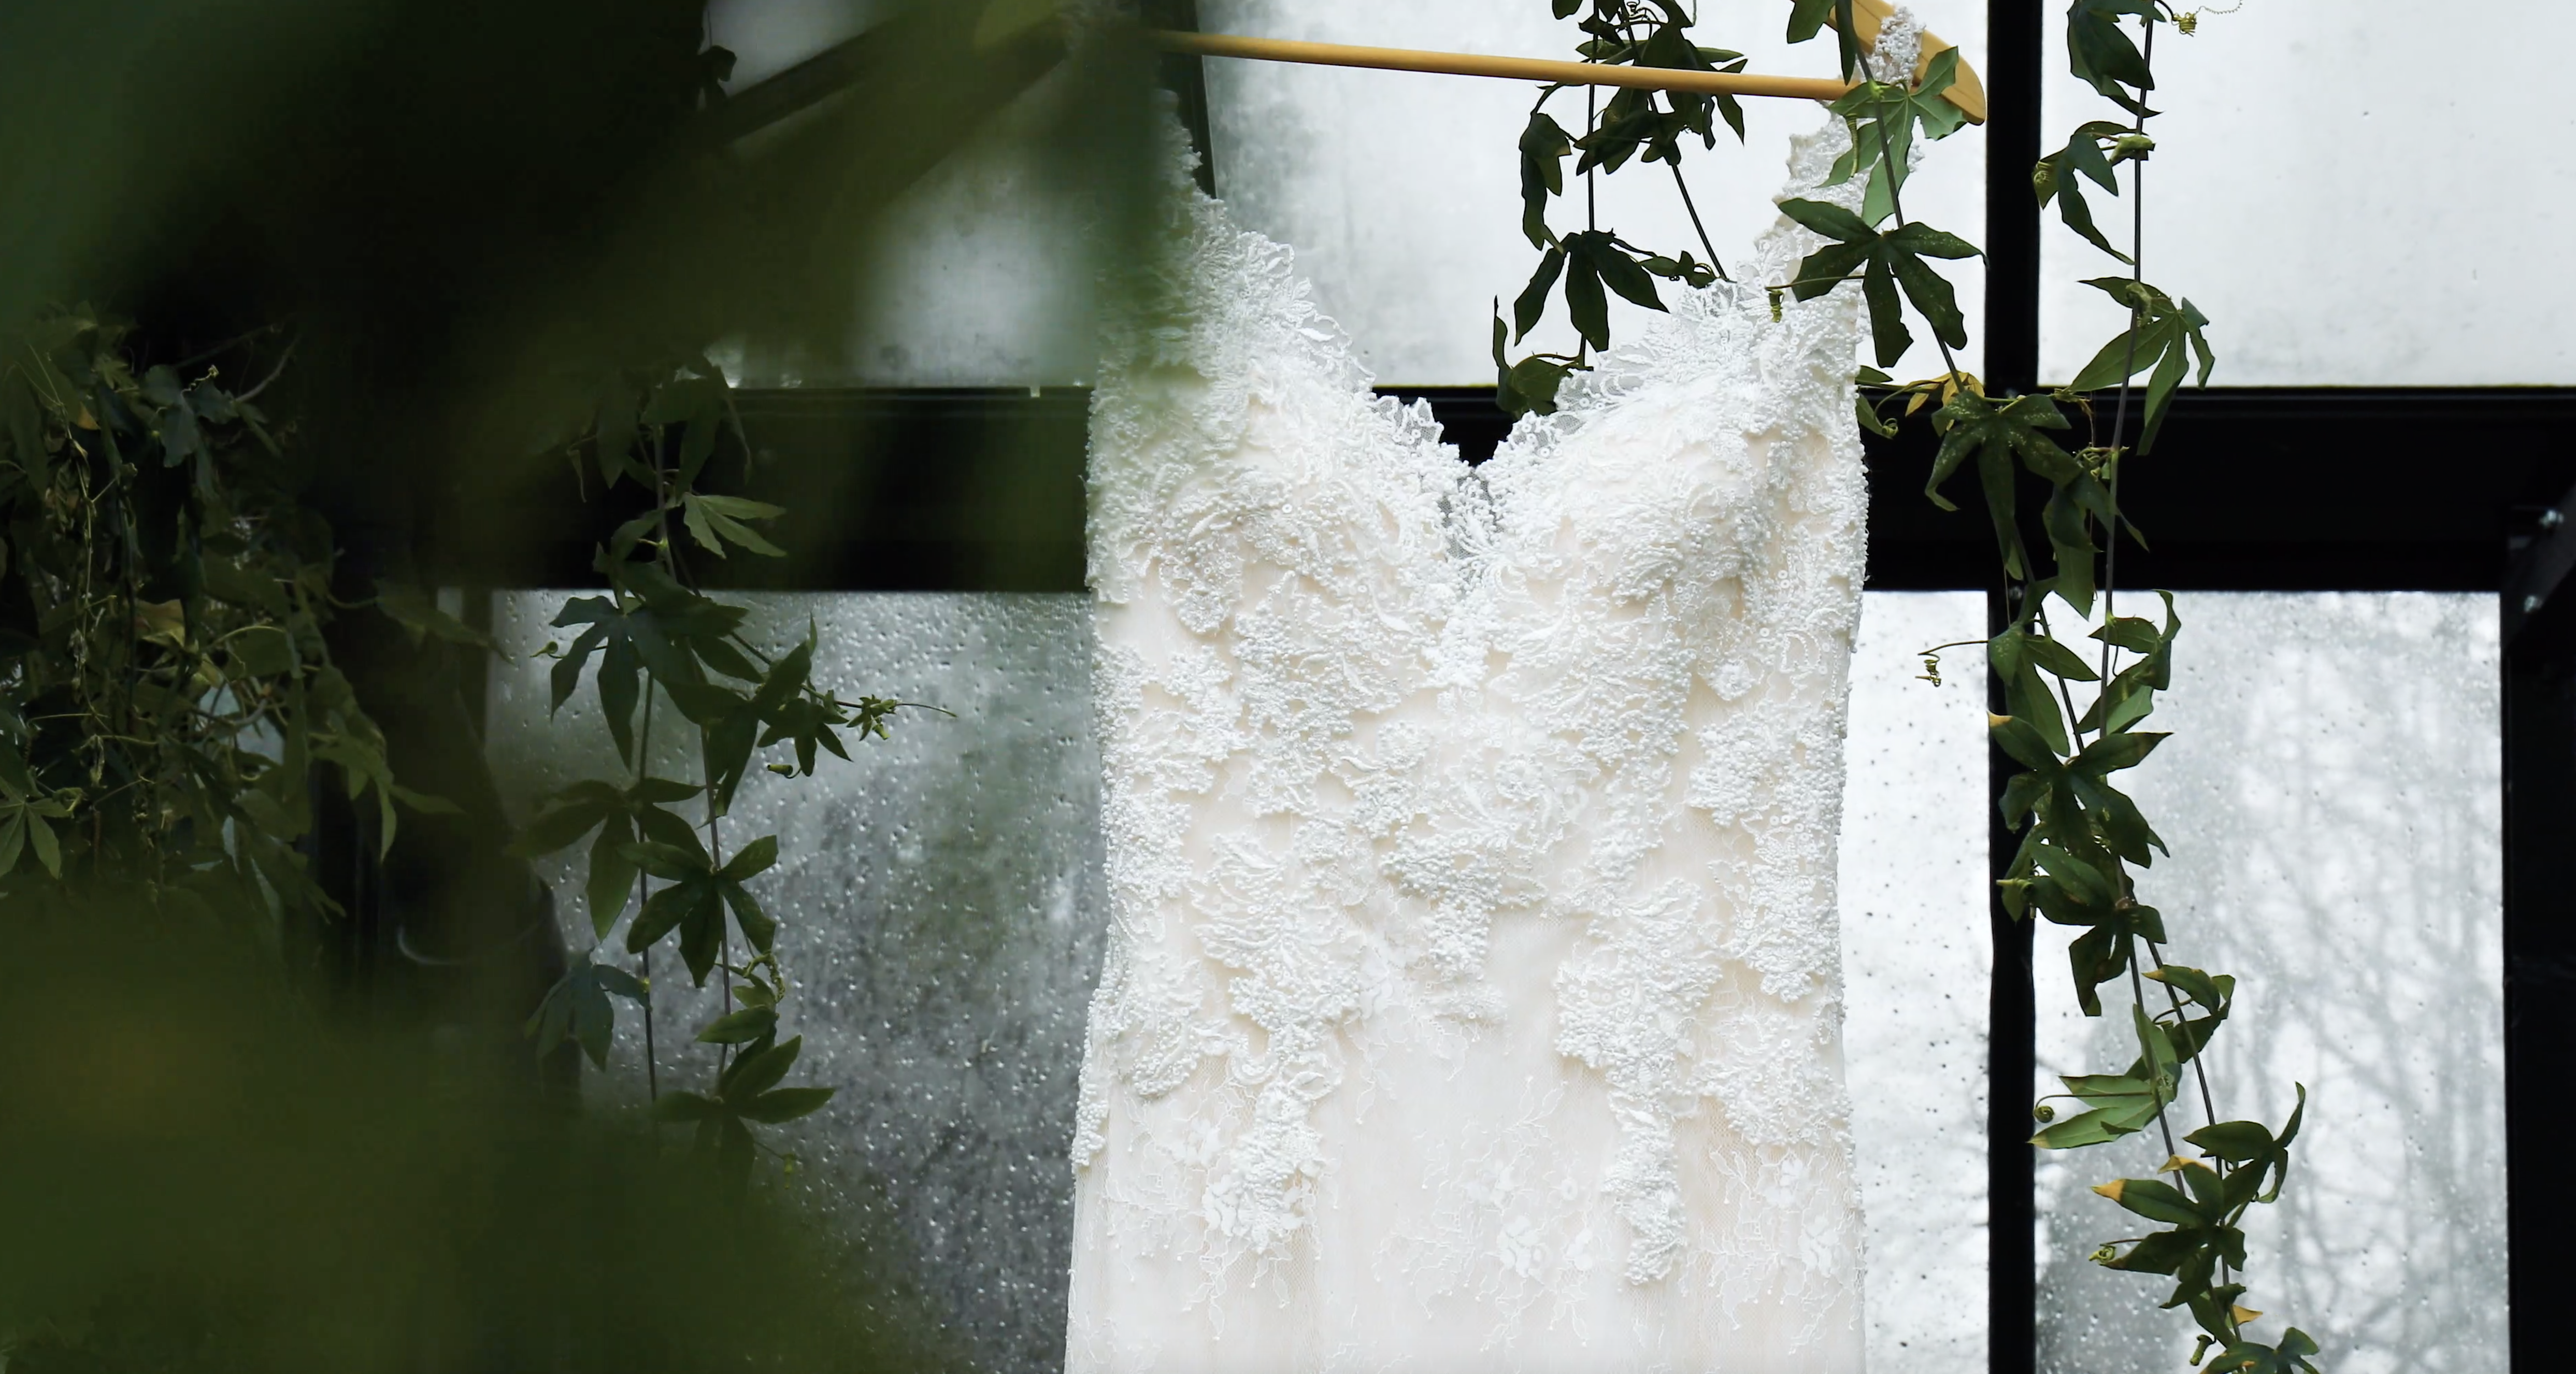 bruiloft bruidsvideo bruidsshoot wedding shoot design content creatie video videografie foto fotografie 4K bedrijven bedrijfsvideo bedrijfsfoto promotie- RSDesigns